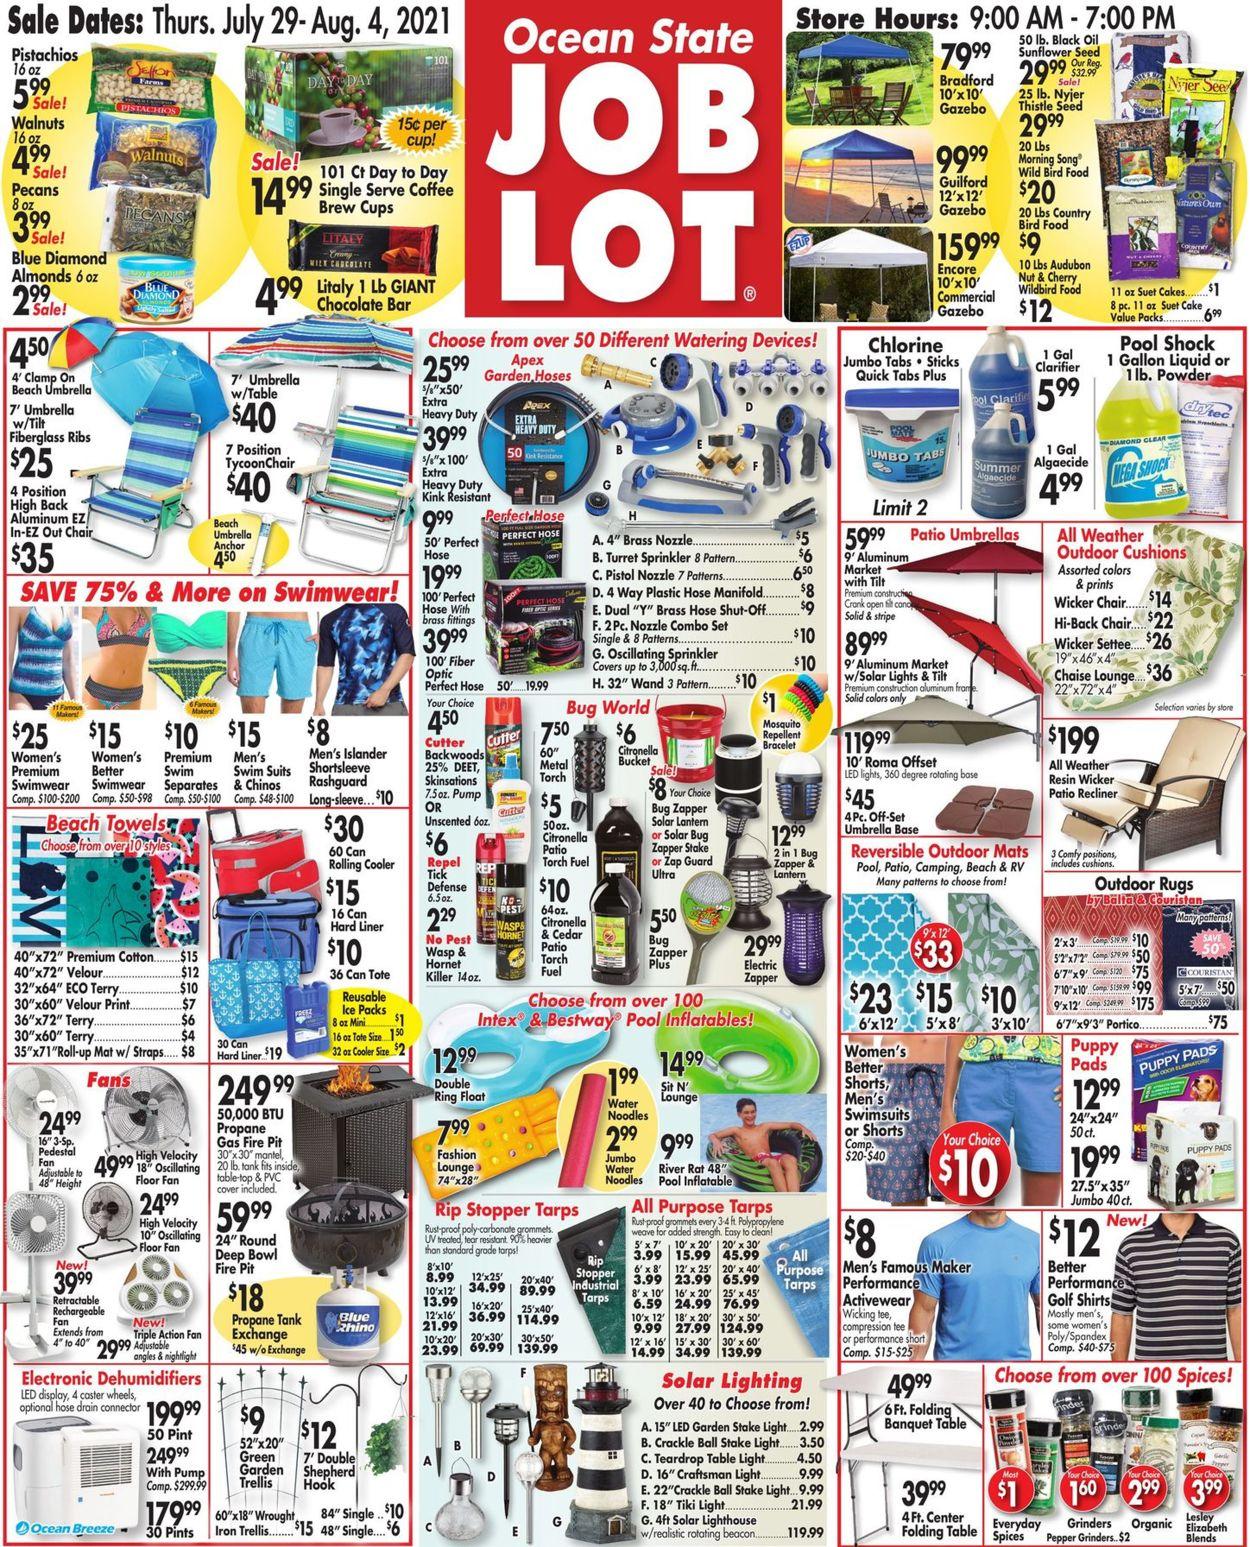 Ocean State Job Lot Weekly Ad Circular - valid 07/29-08/04/2021